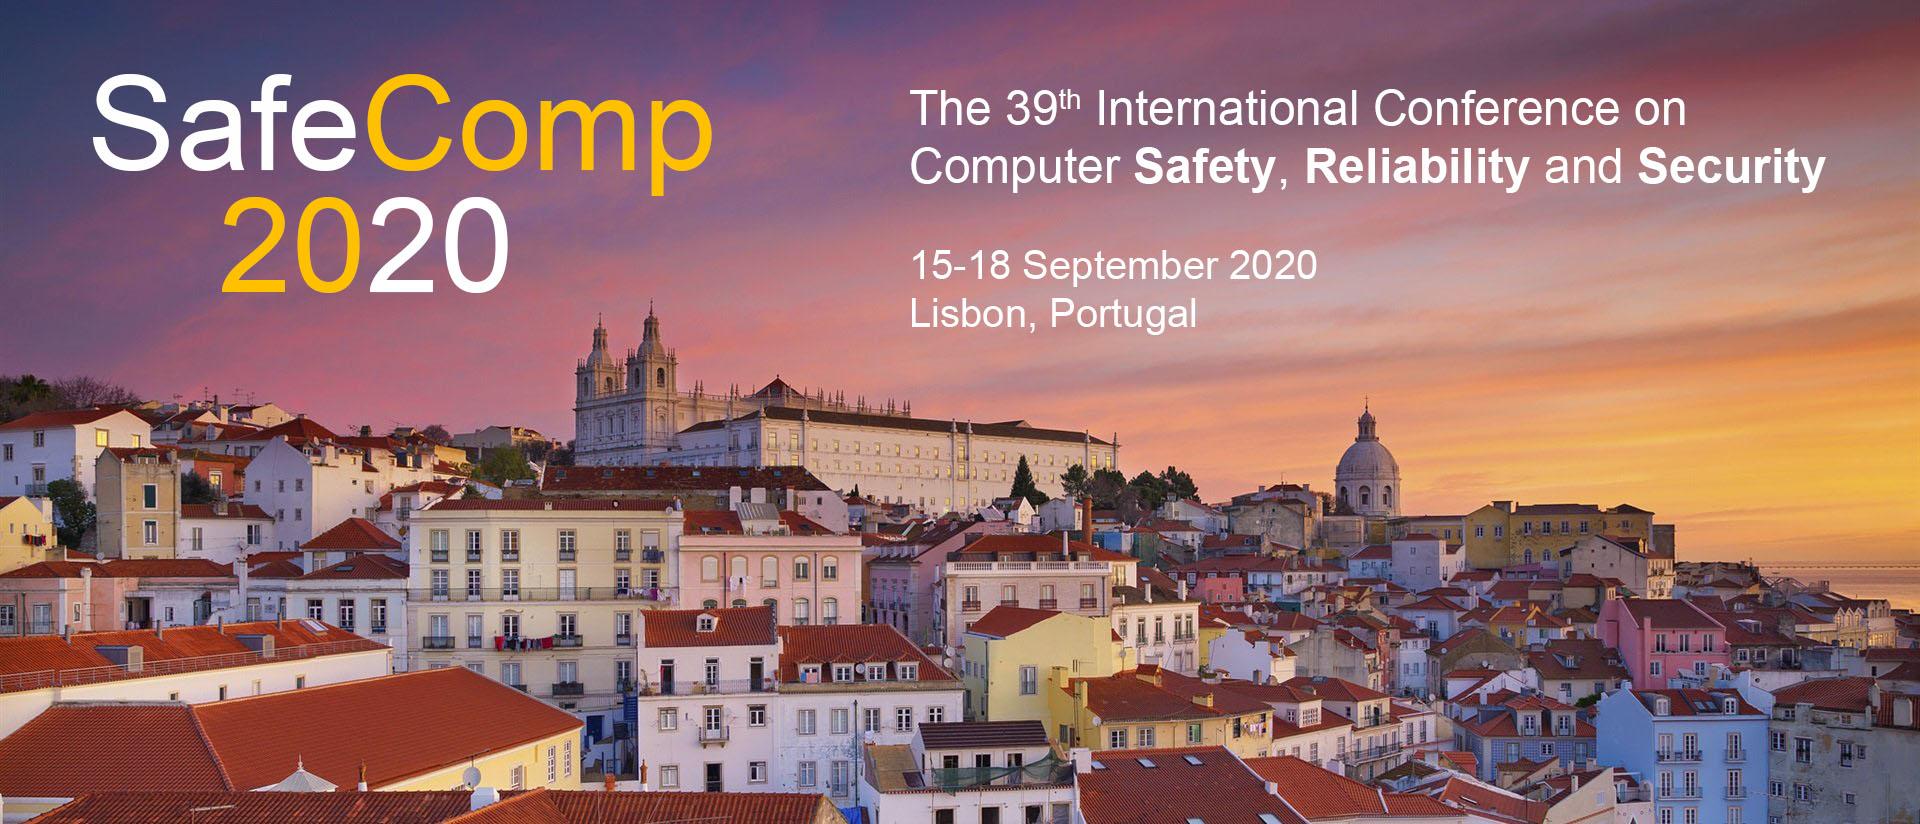 SafeComp 2020